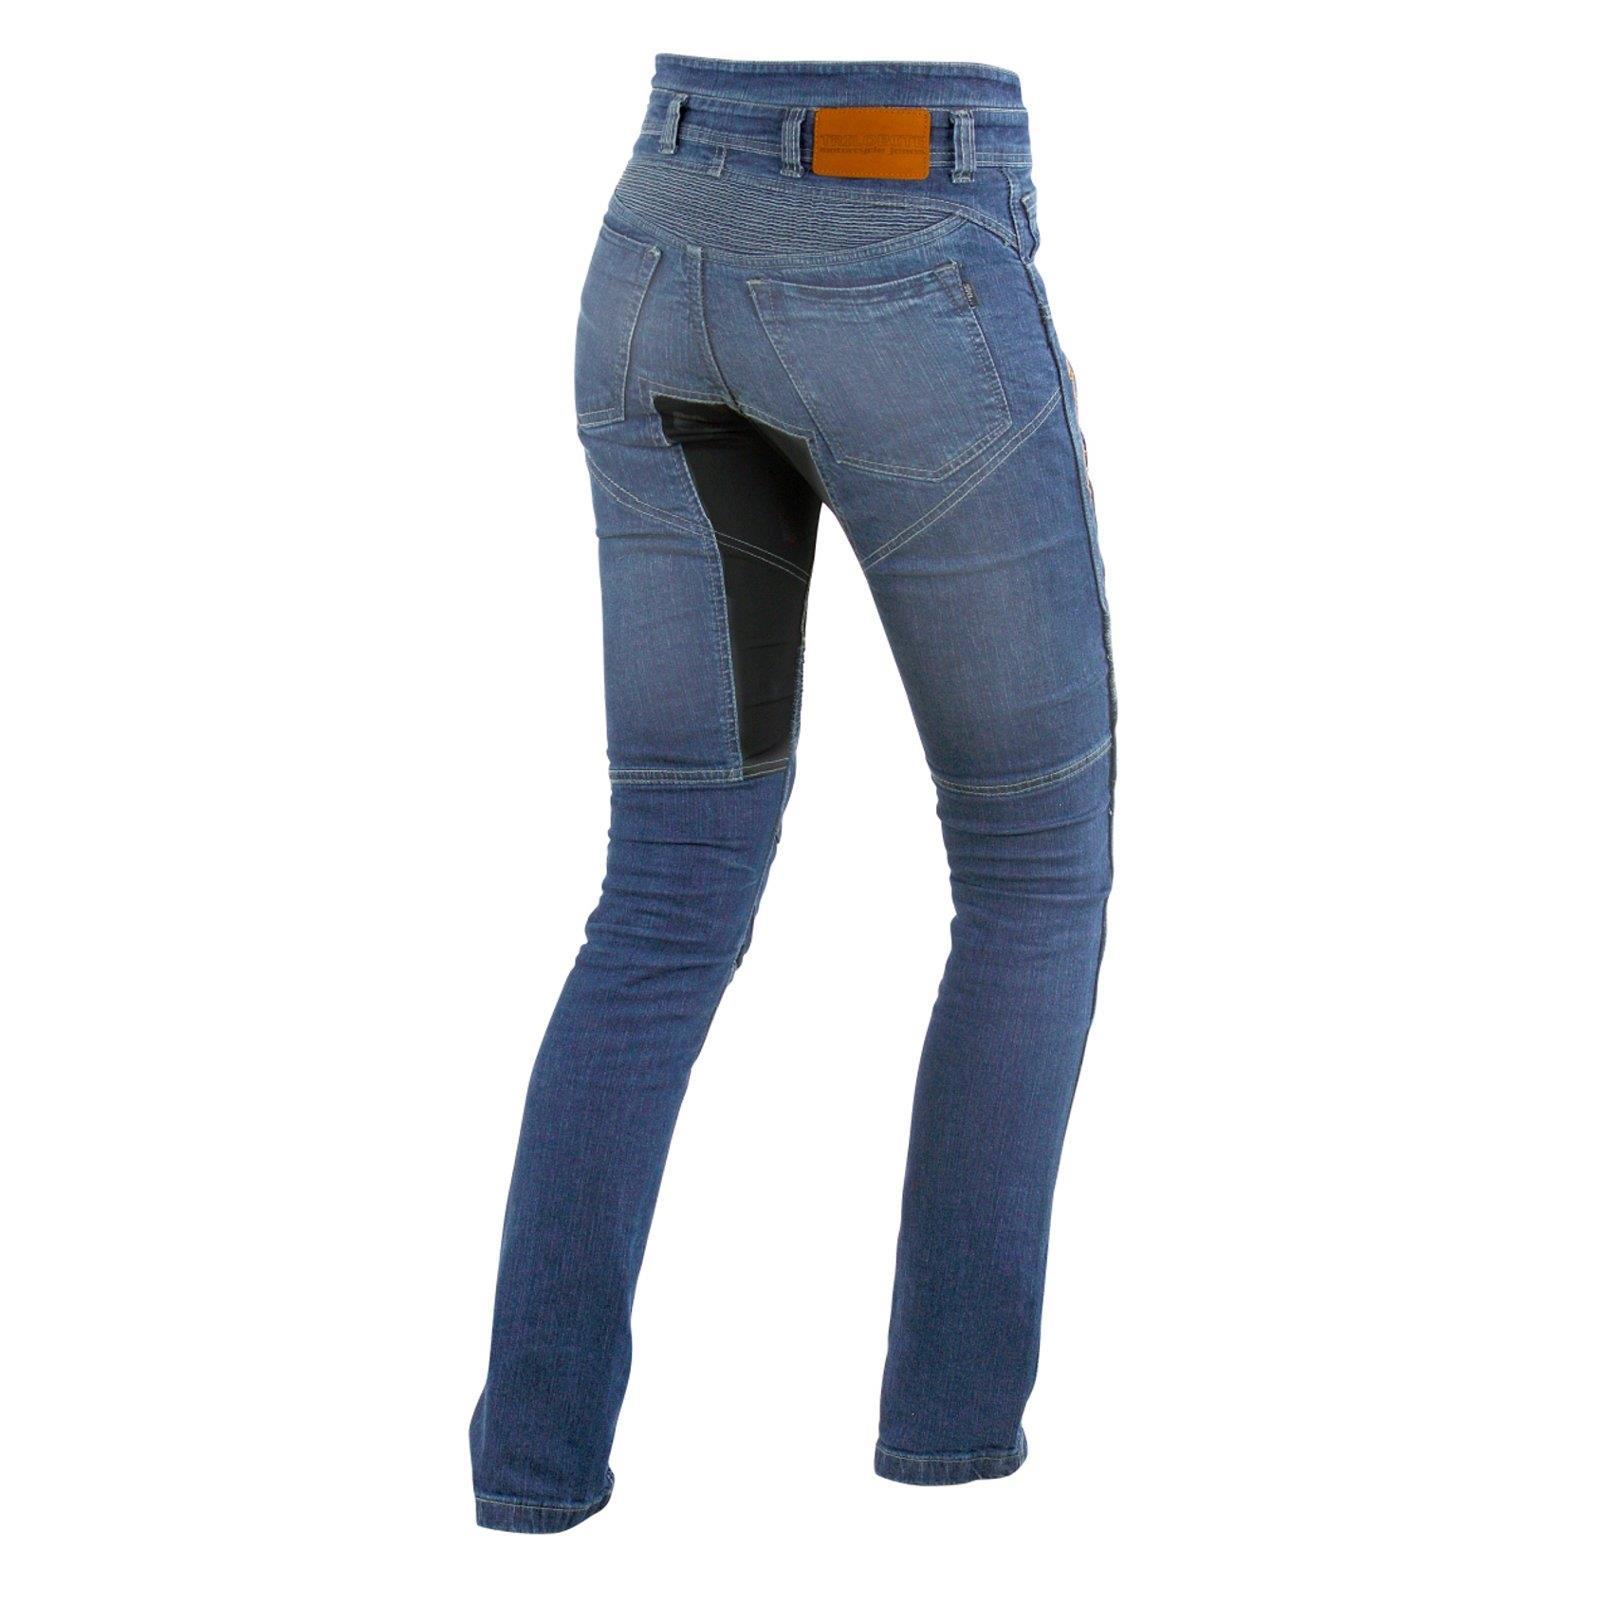 7077674fcd13 Details zu Trilobite Parado Motorrad Jeans Hose L34 Blau Damen Stretch  Abriebfest Reißfest